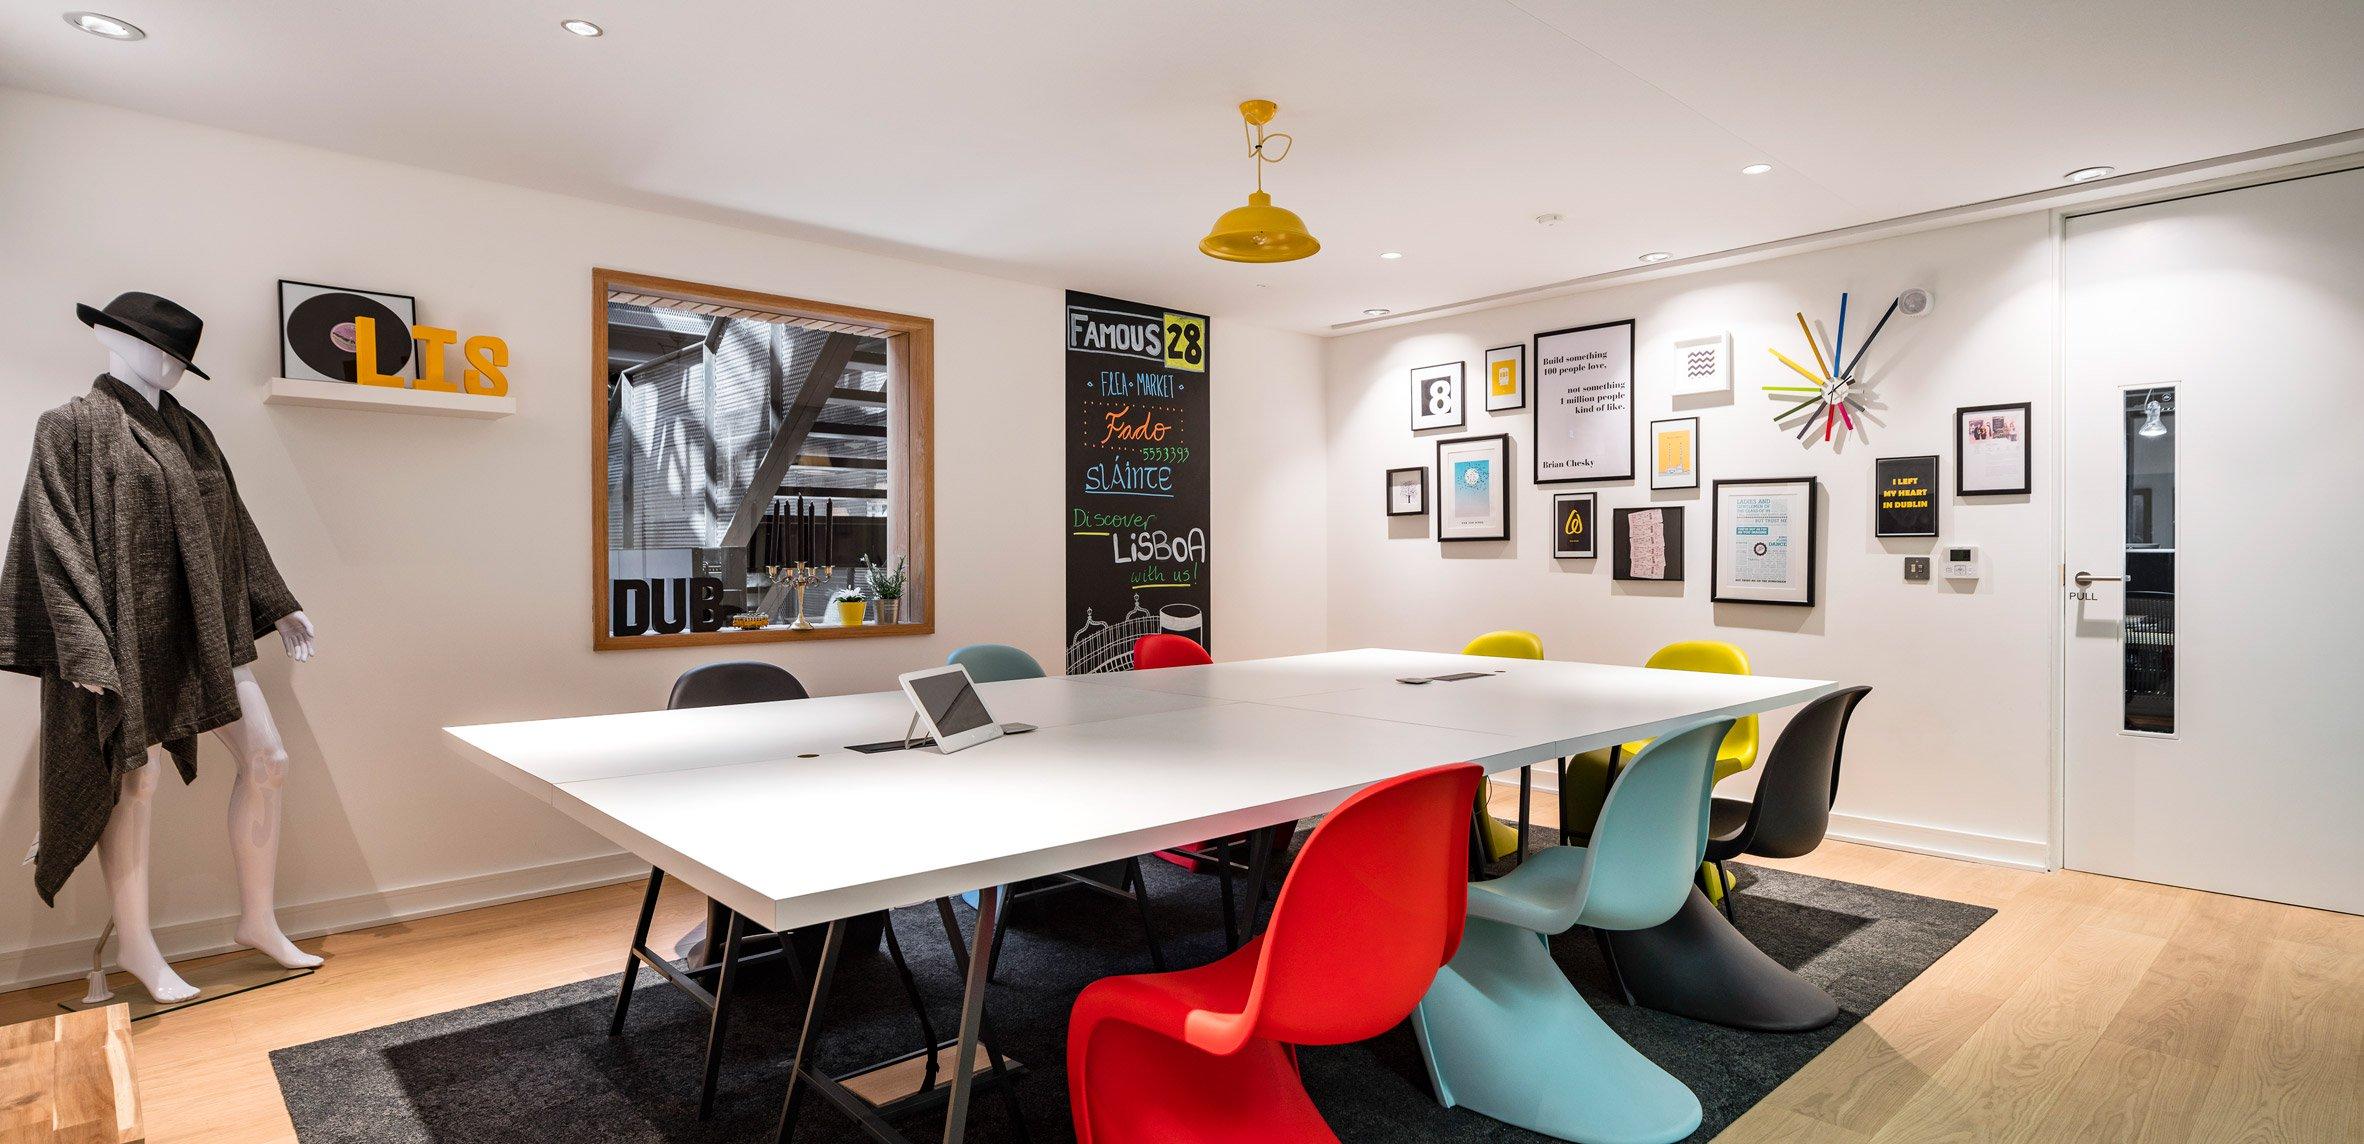 airbnb-dublin-office-interiors-ireland-offices_dezeen_2364_col_26